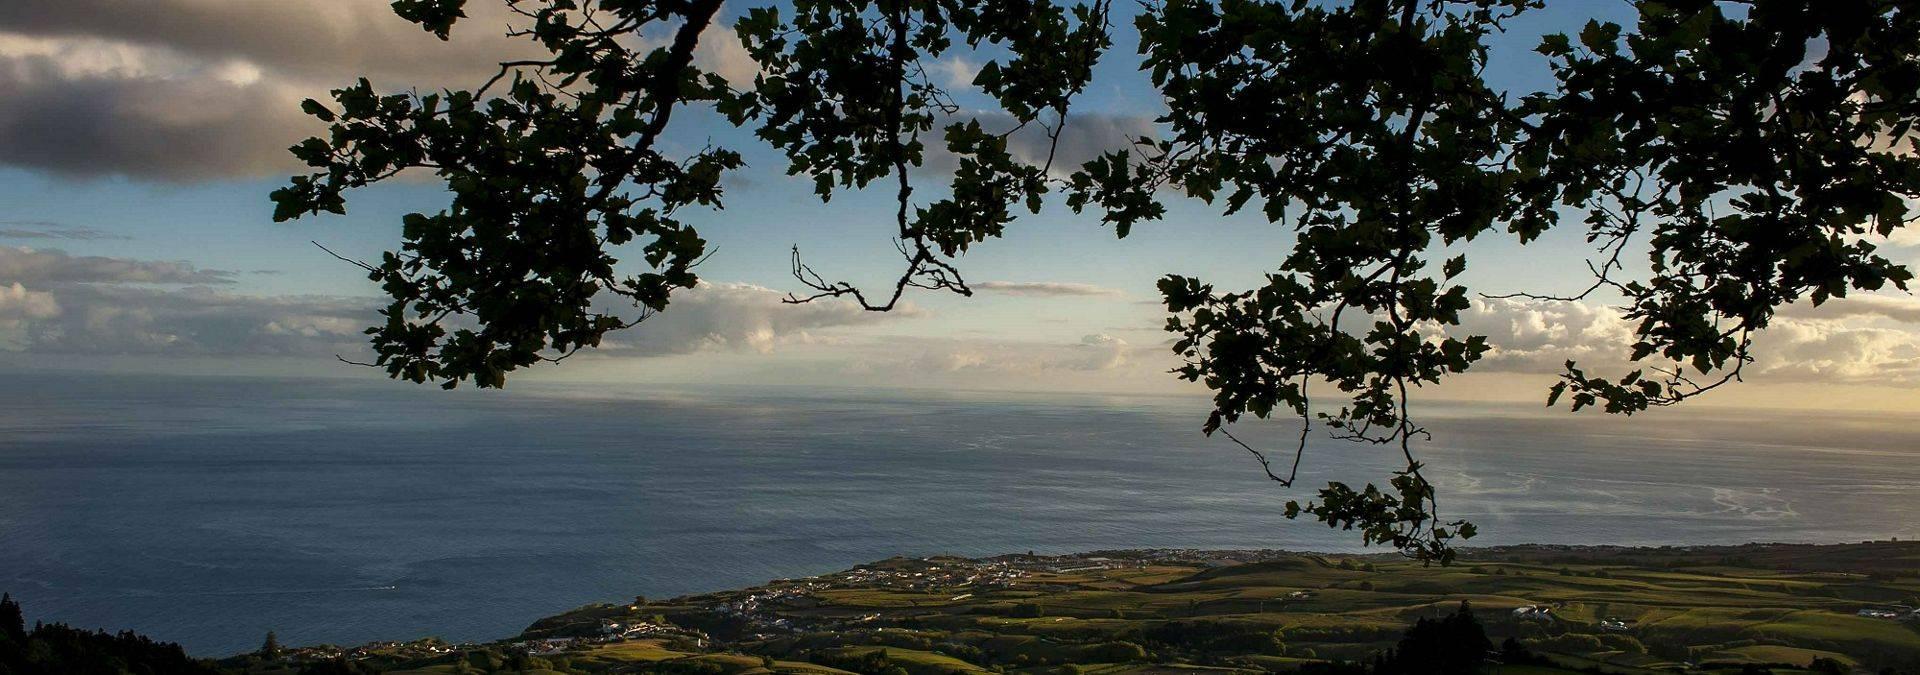 Landscape   Turismo Dos AçOres   Resized